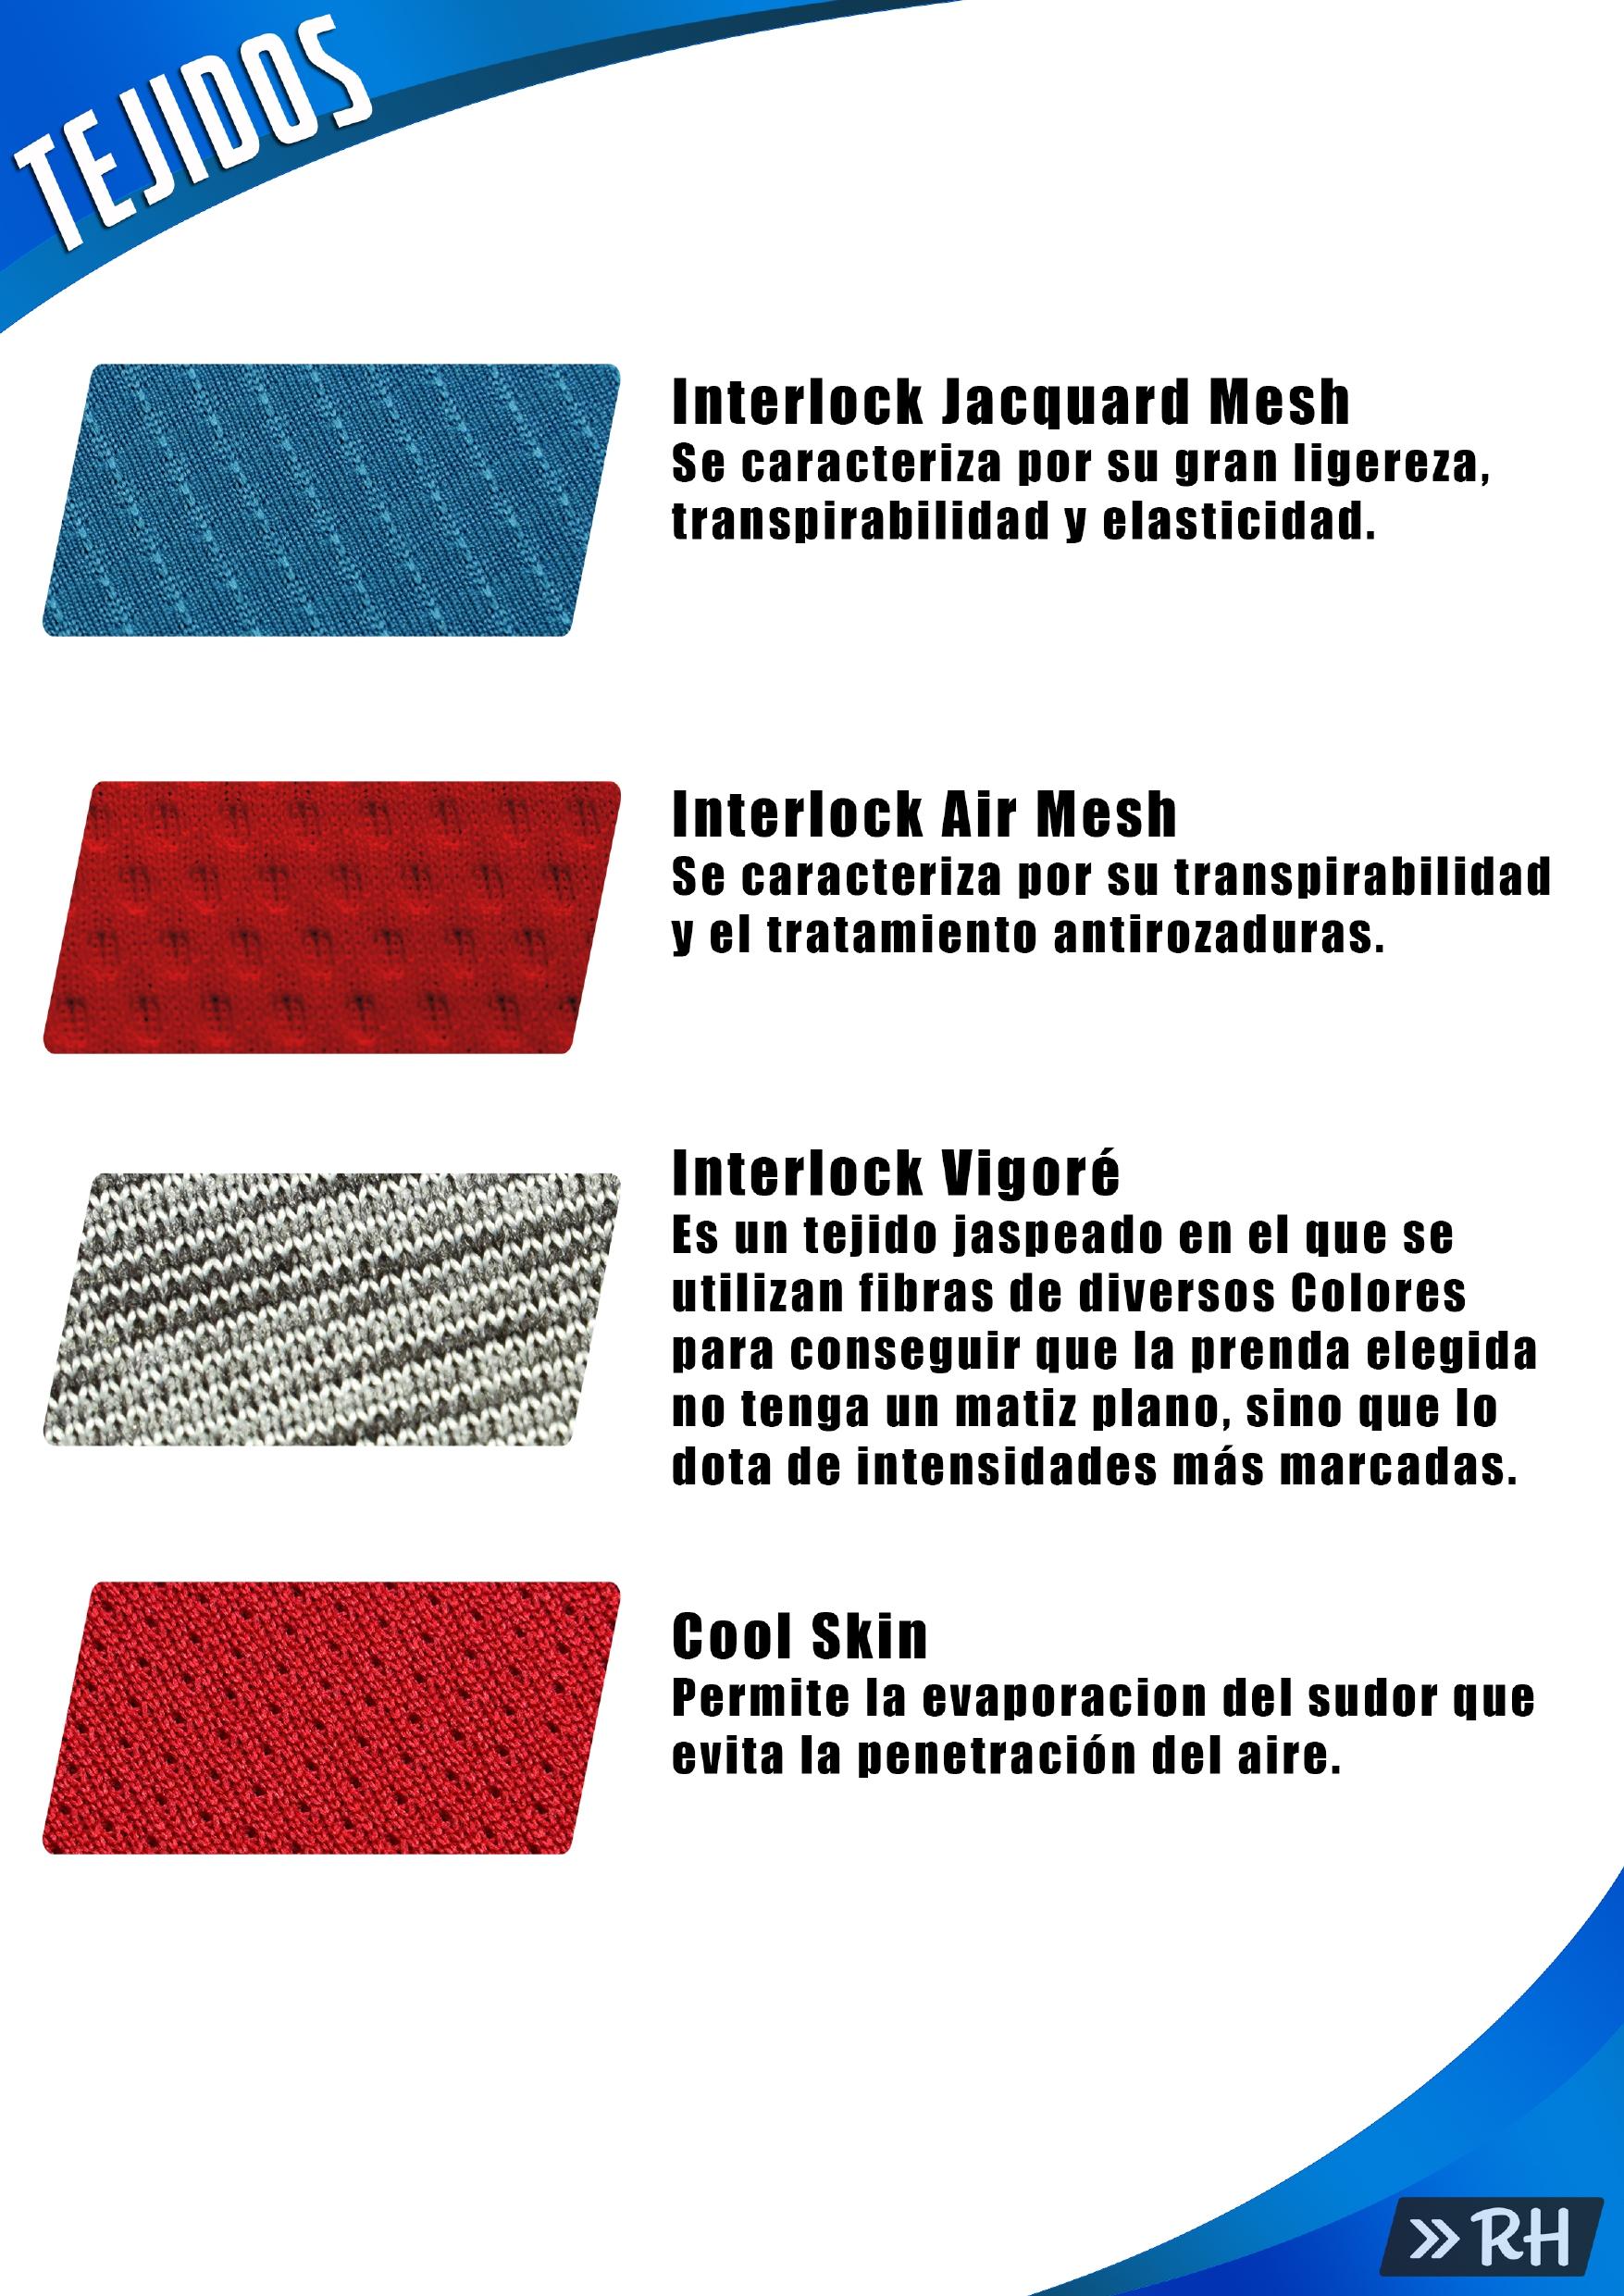 Camisetas tecnicas RH (2020)_page-0004